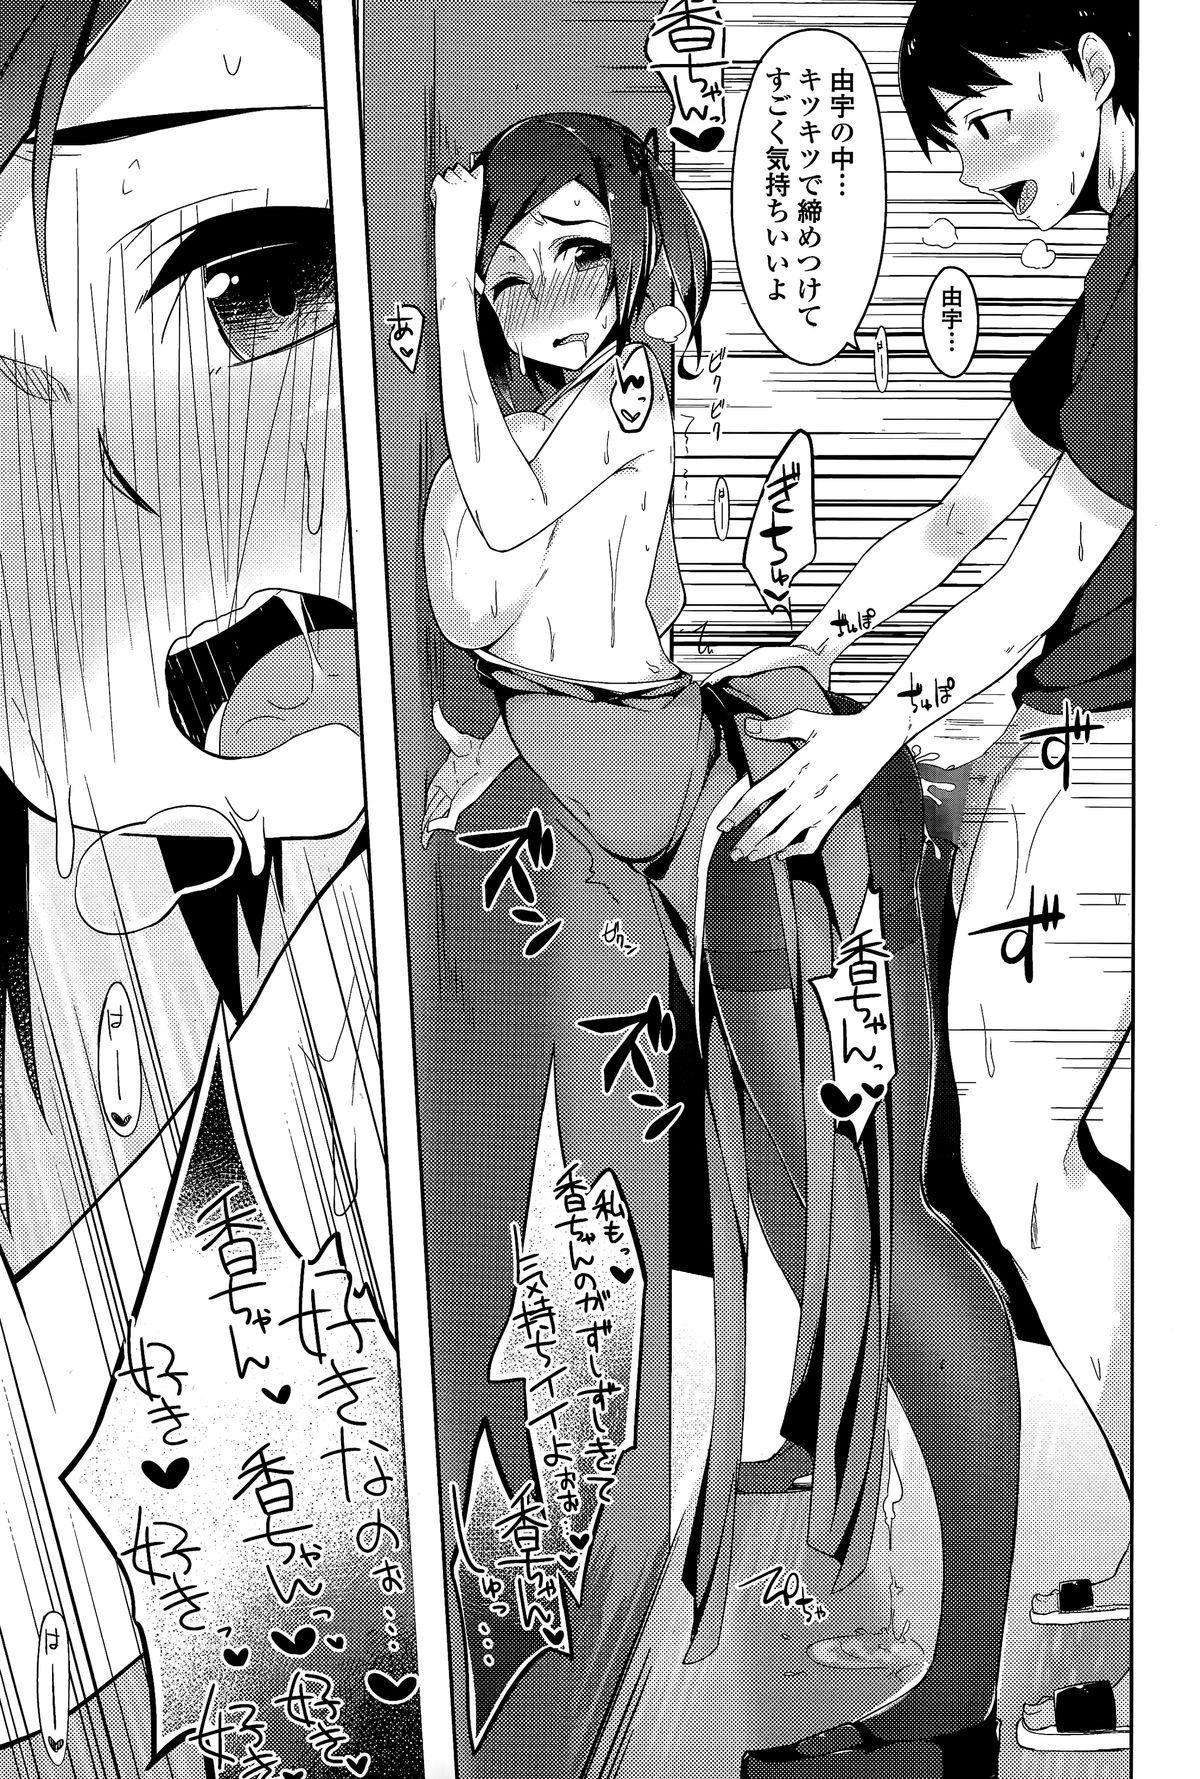 Comic Toutetsu 2015-02 Vol. 3 182